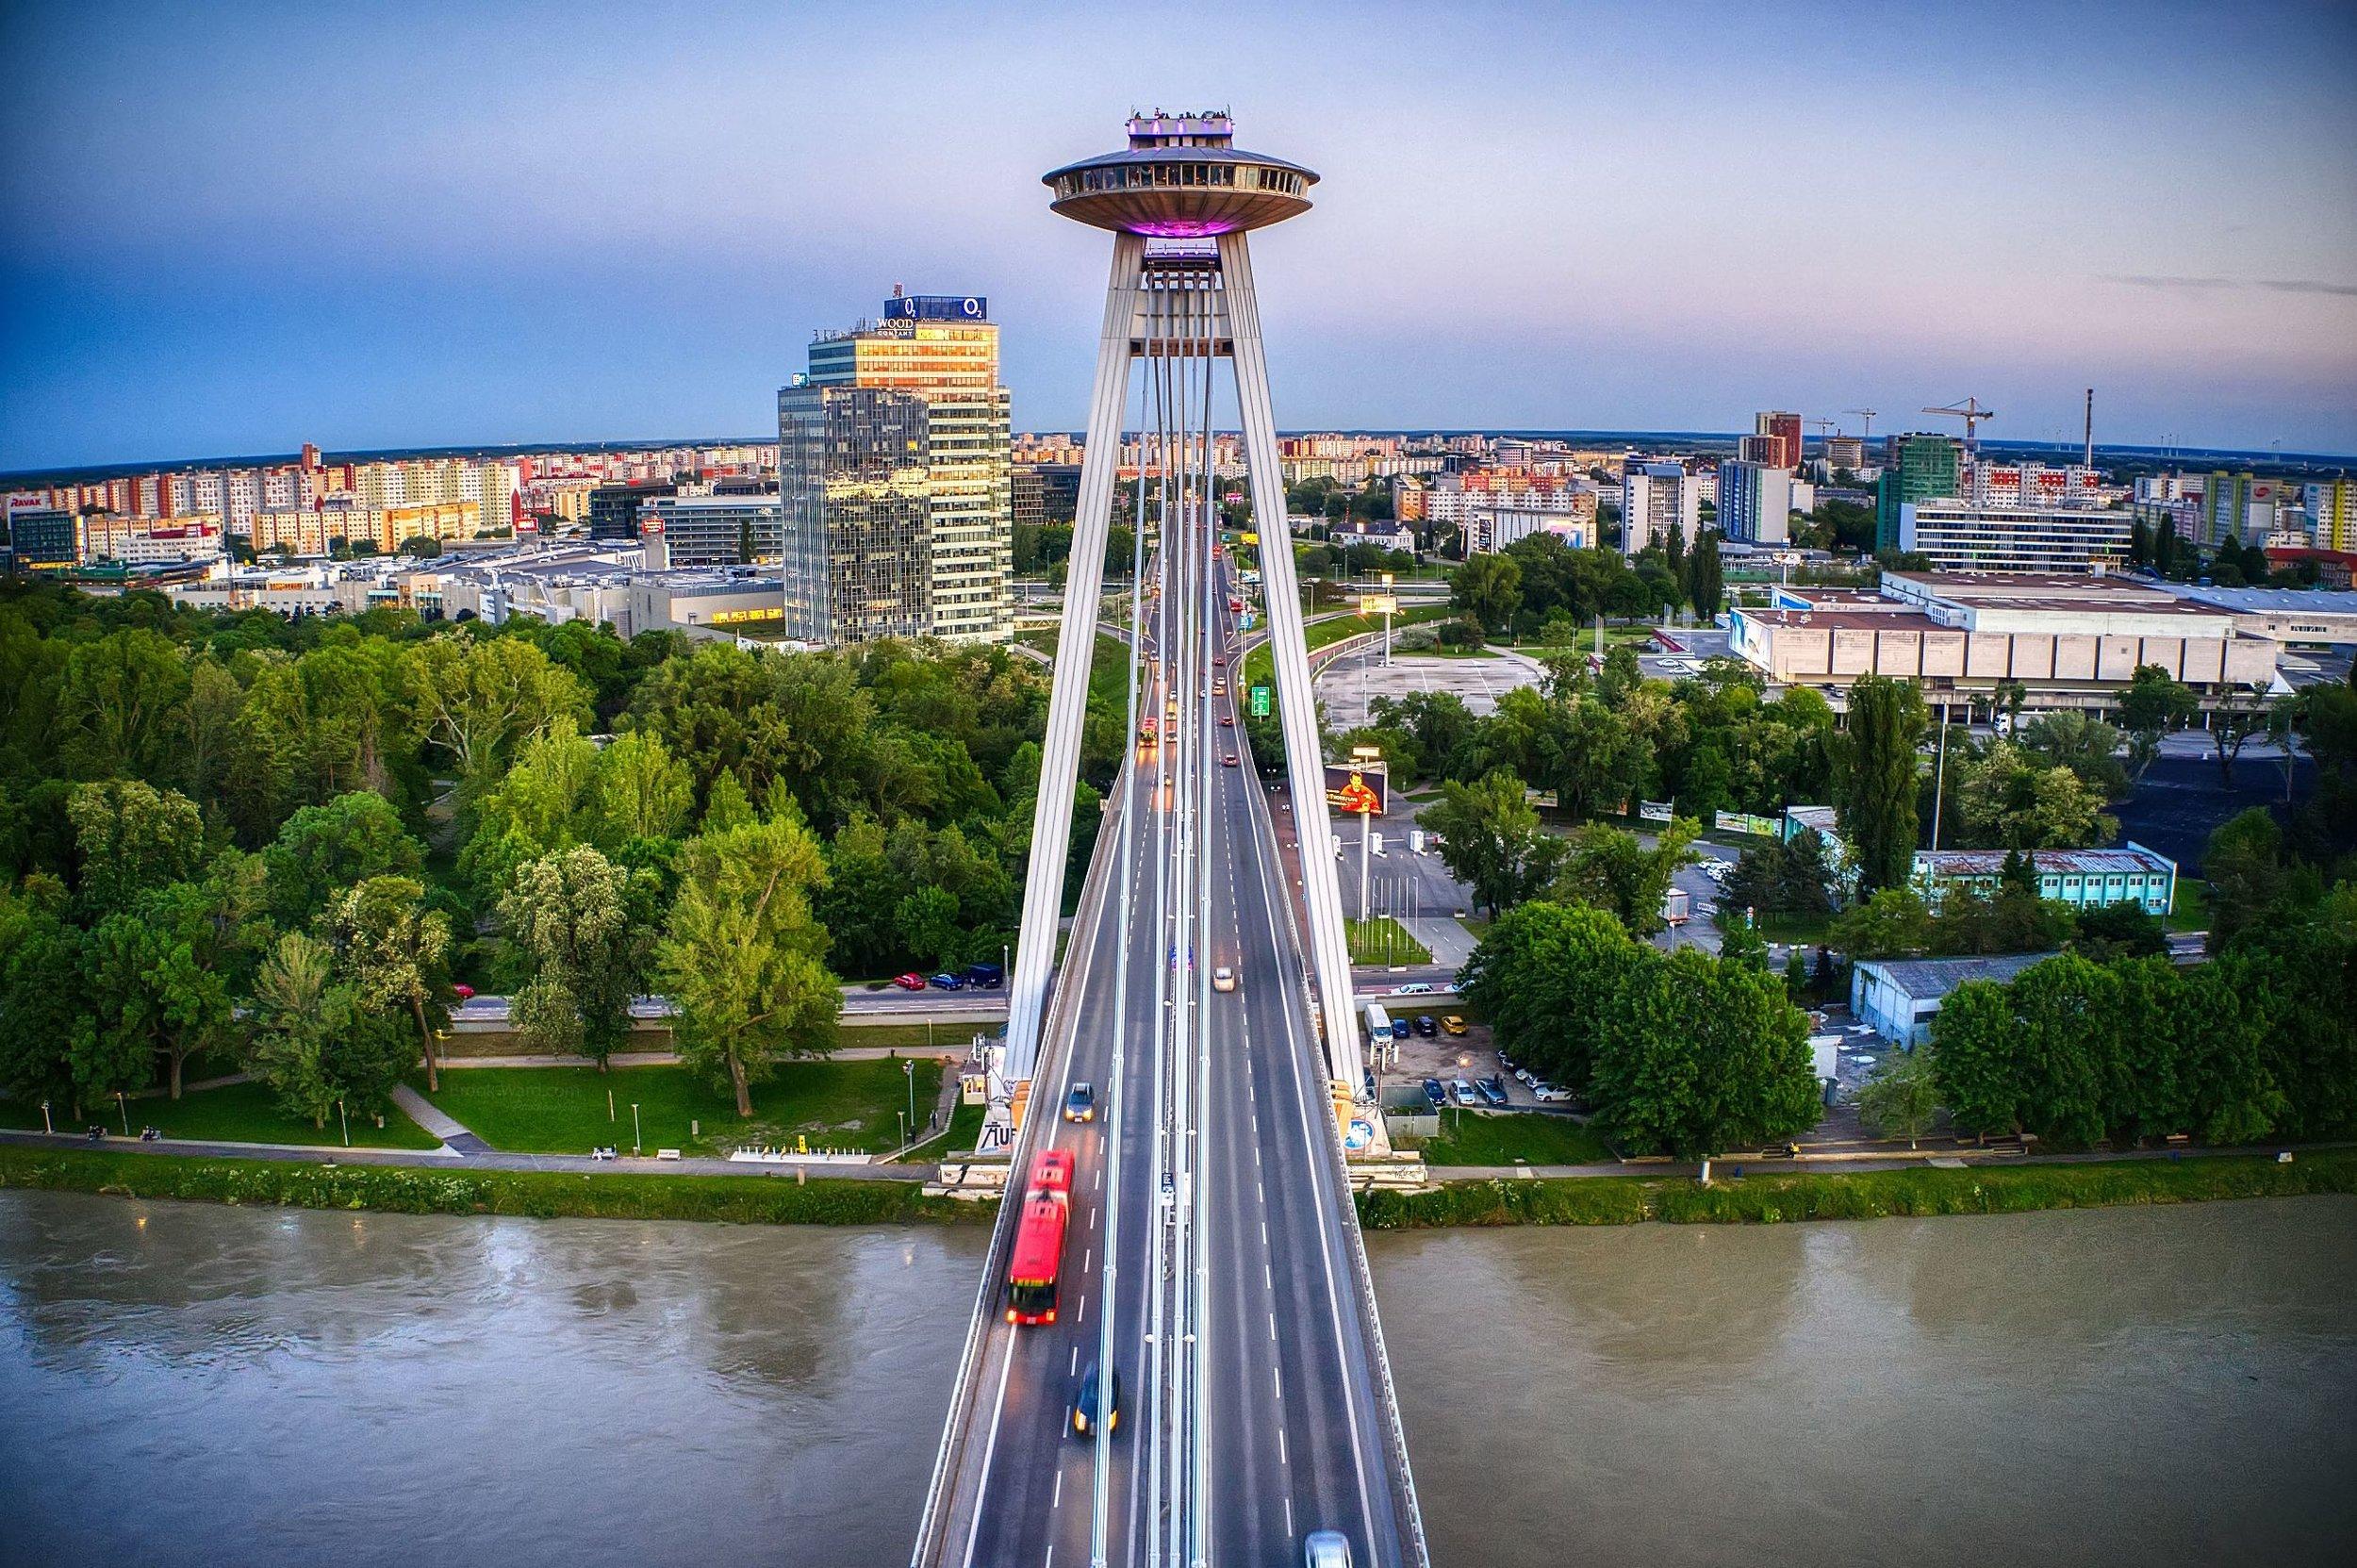 UFO Observation Deck - Bratislava